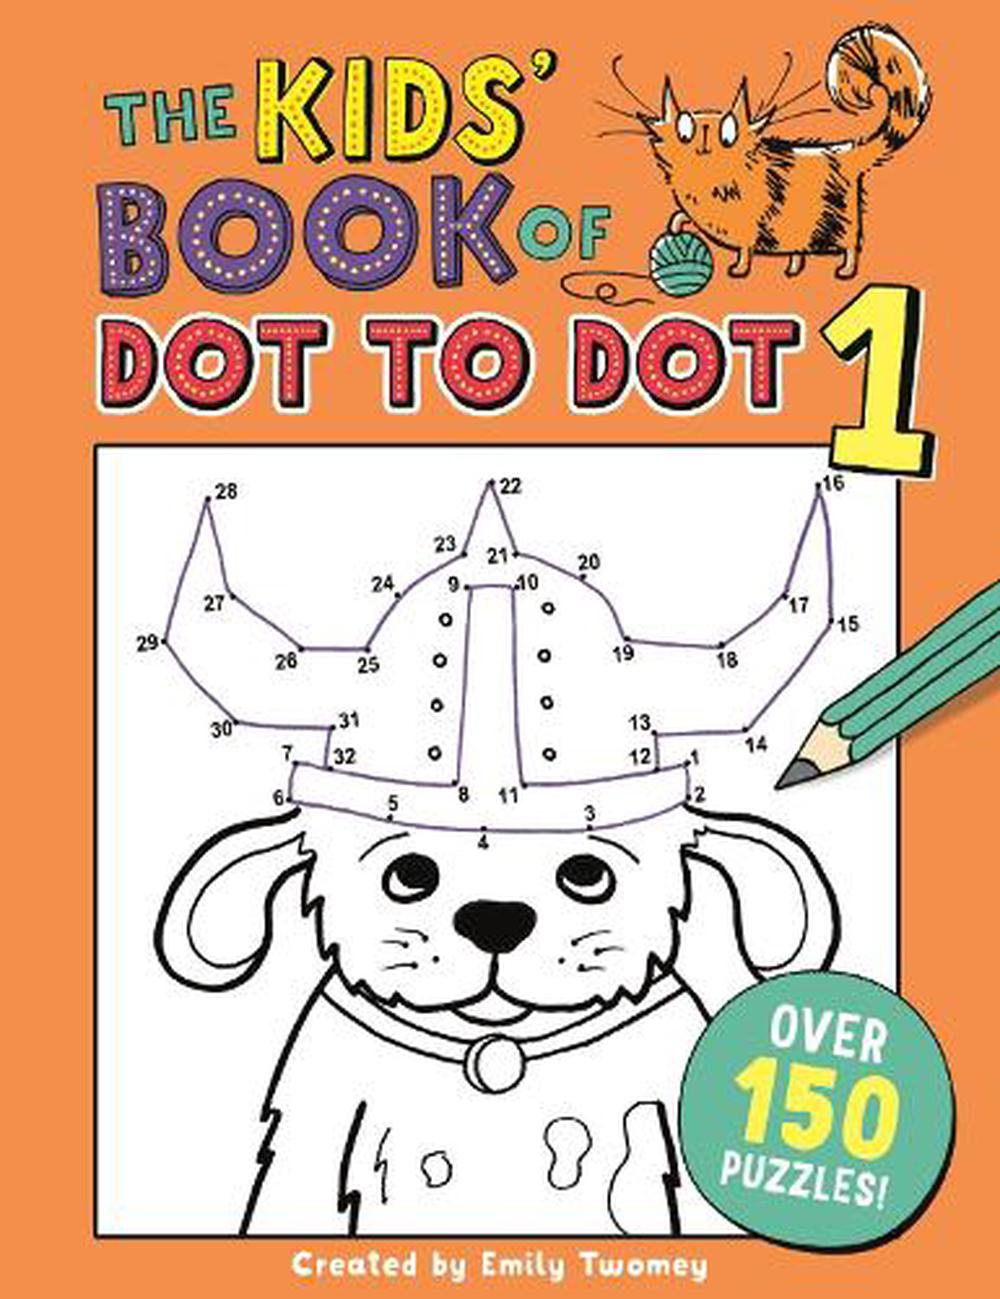 Kids' Book of Dot to Dot 1